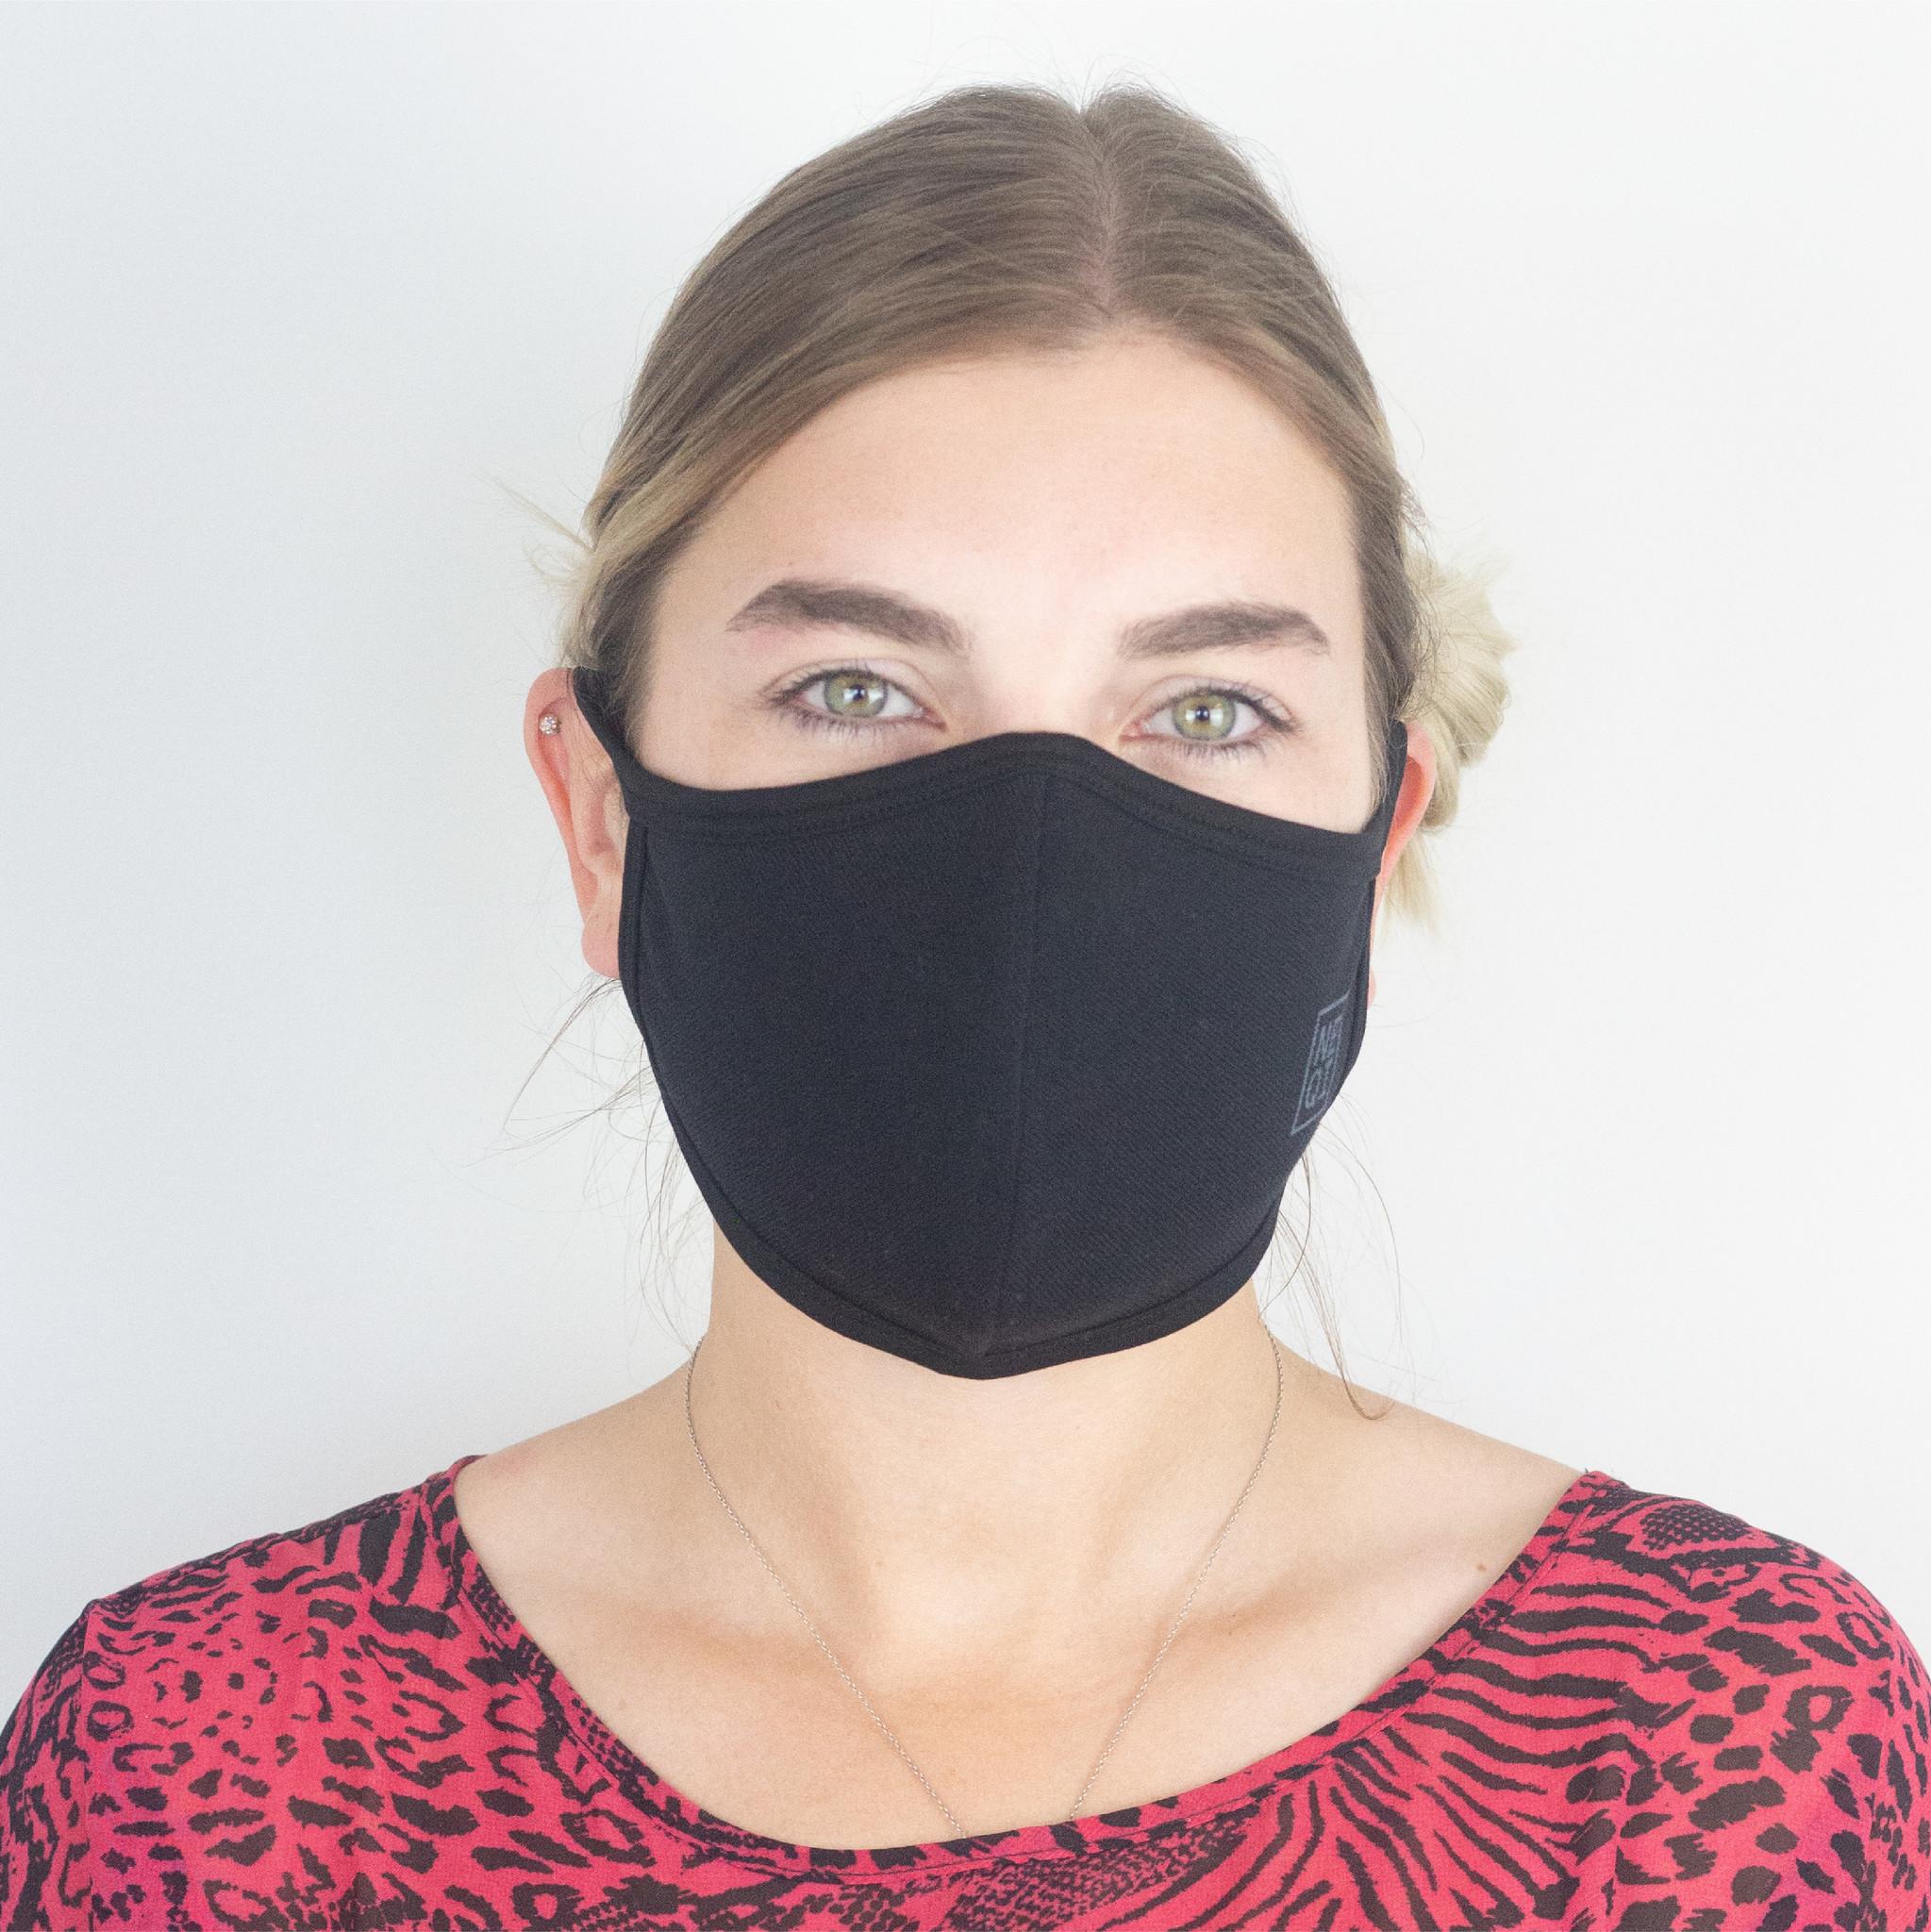 NEQI Black Small/Medium Re-useable Face Mask (12 Case)